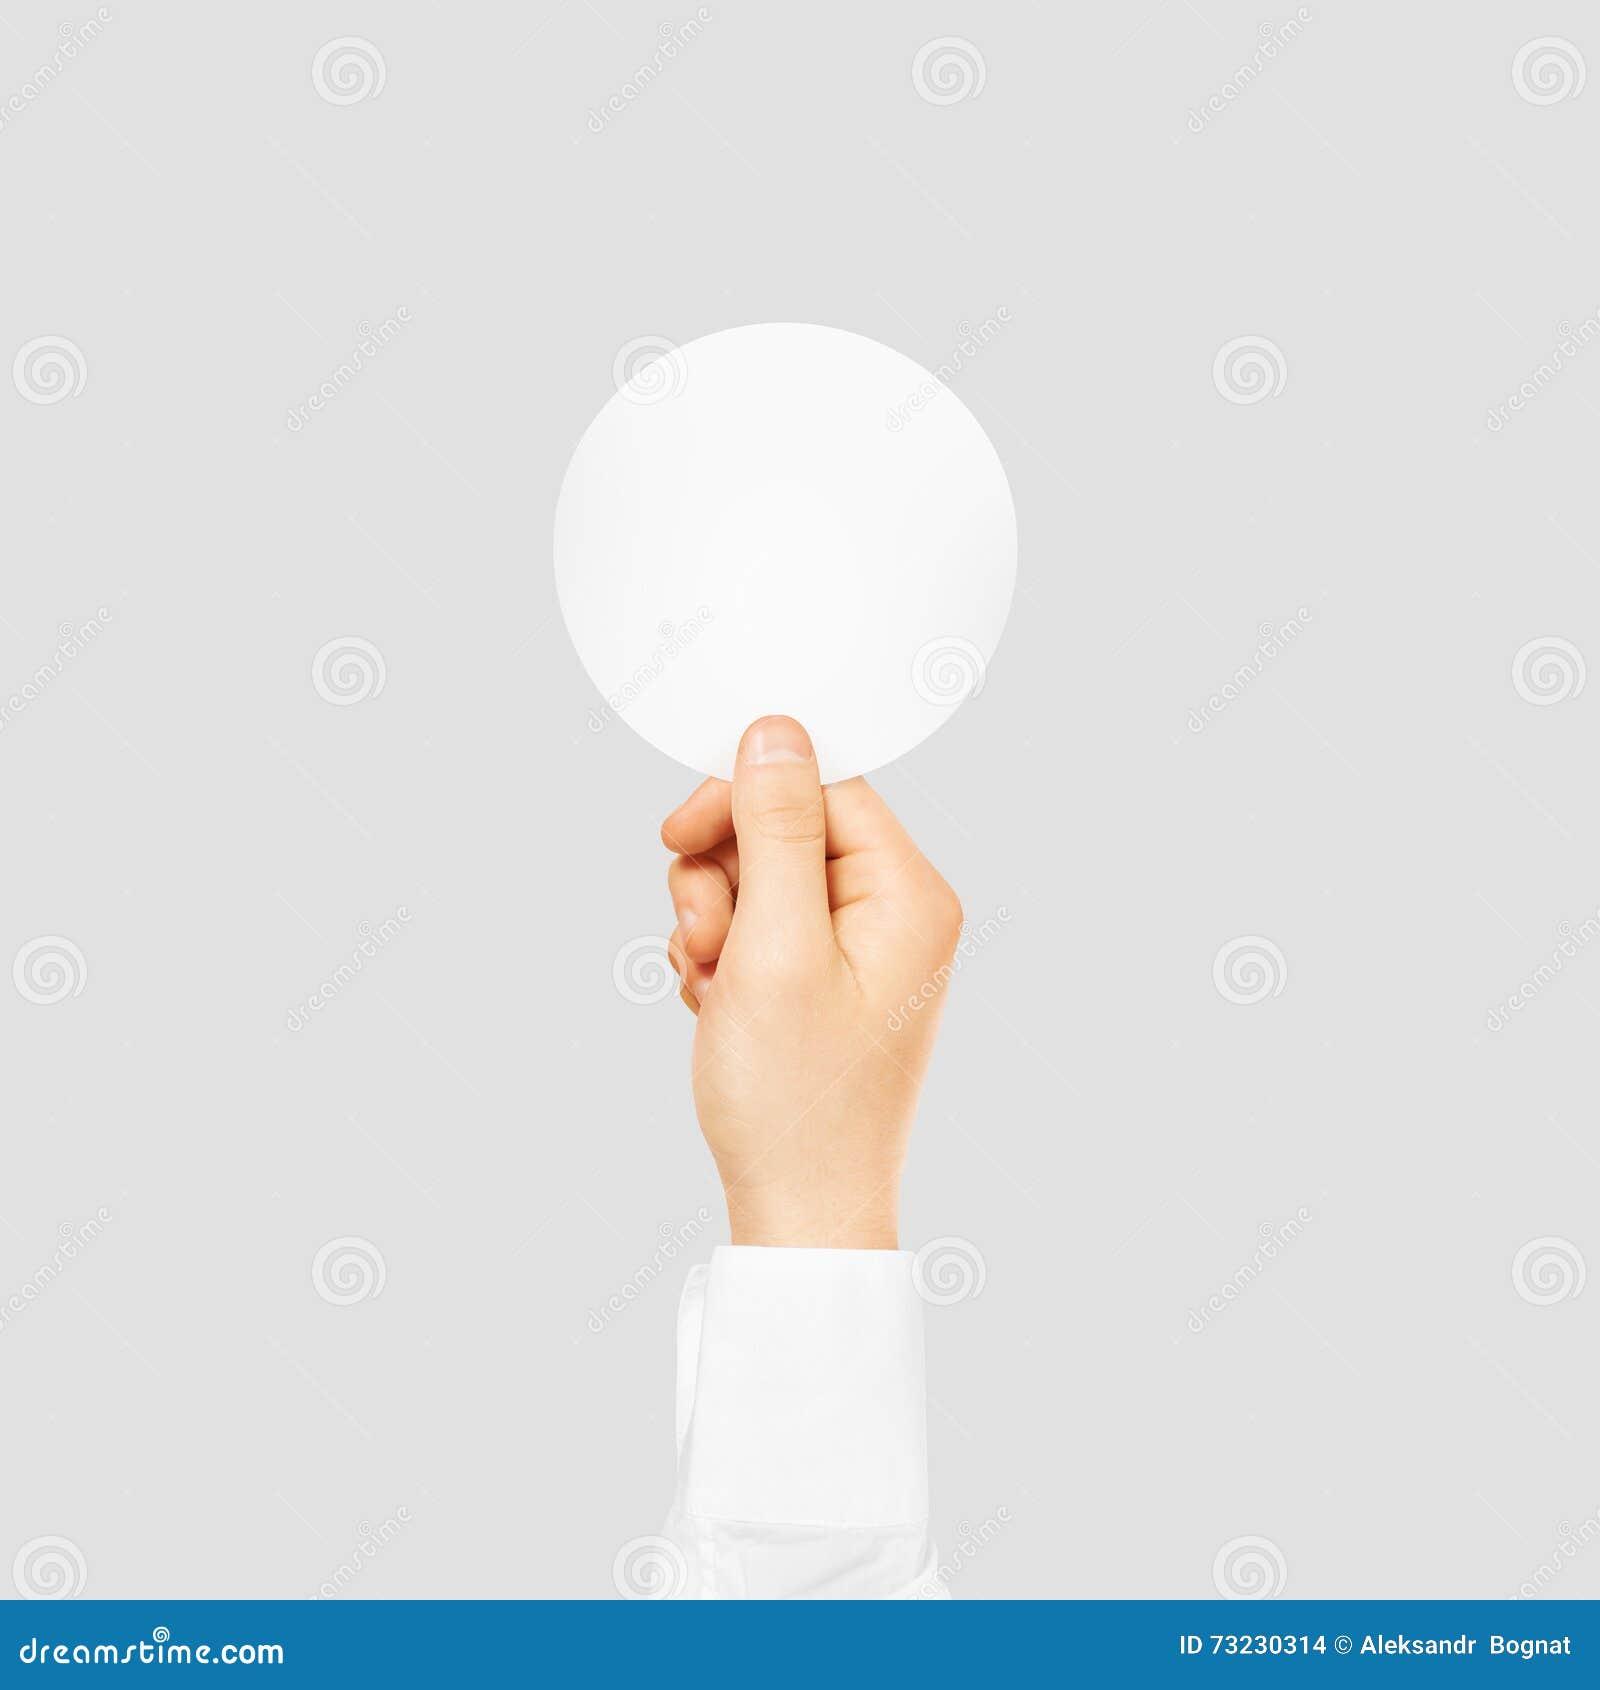 Hand Holding Round Blank White Sticker Mock Up Isolated On